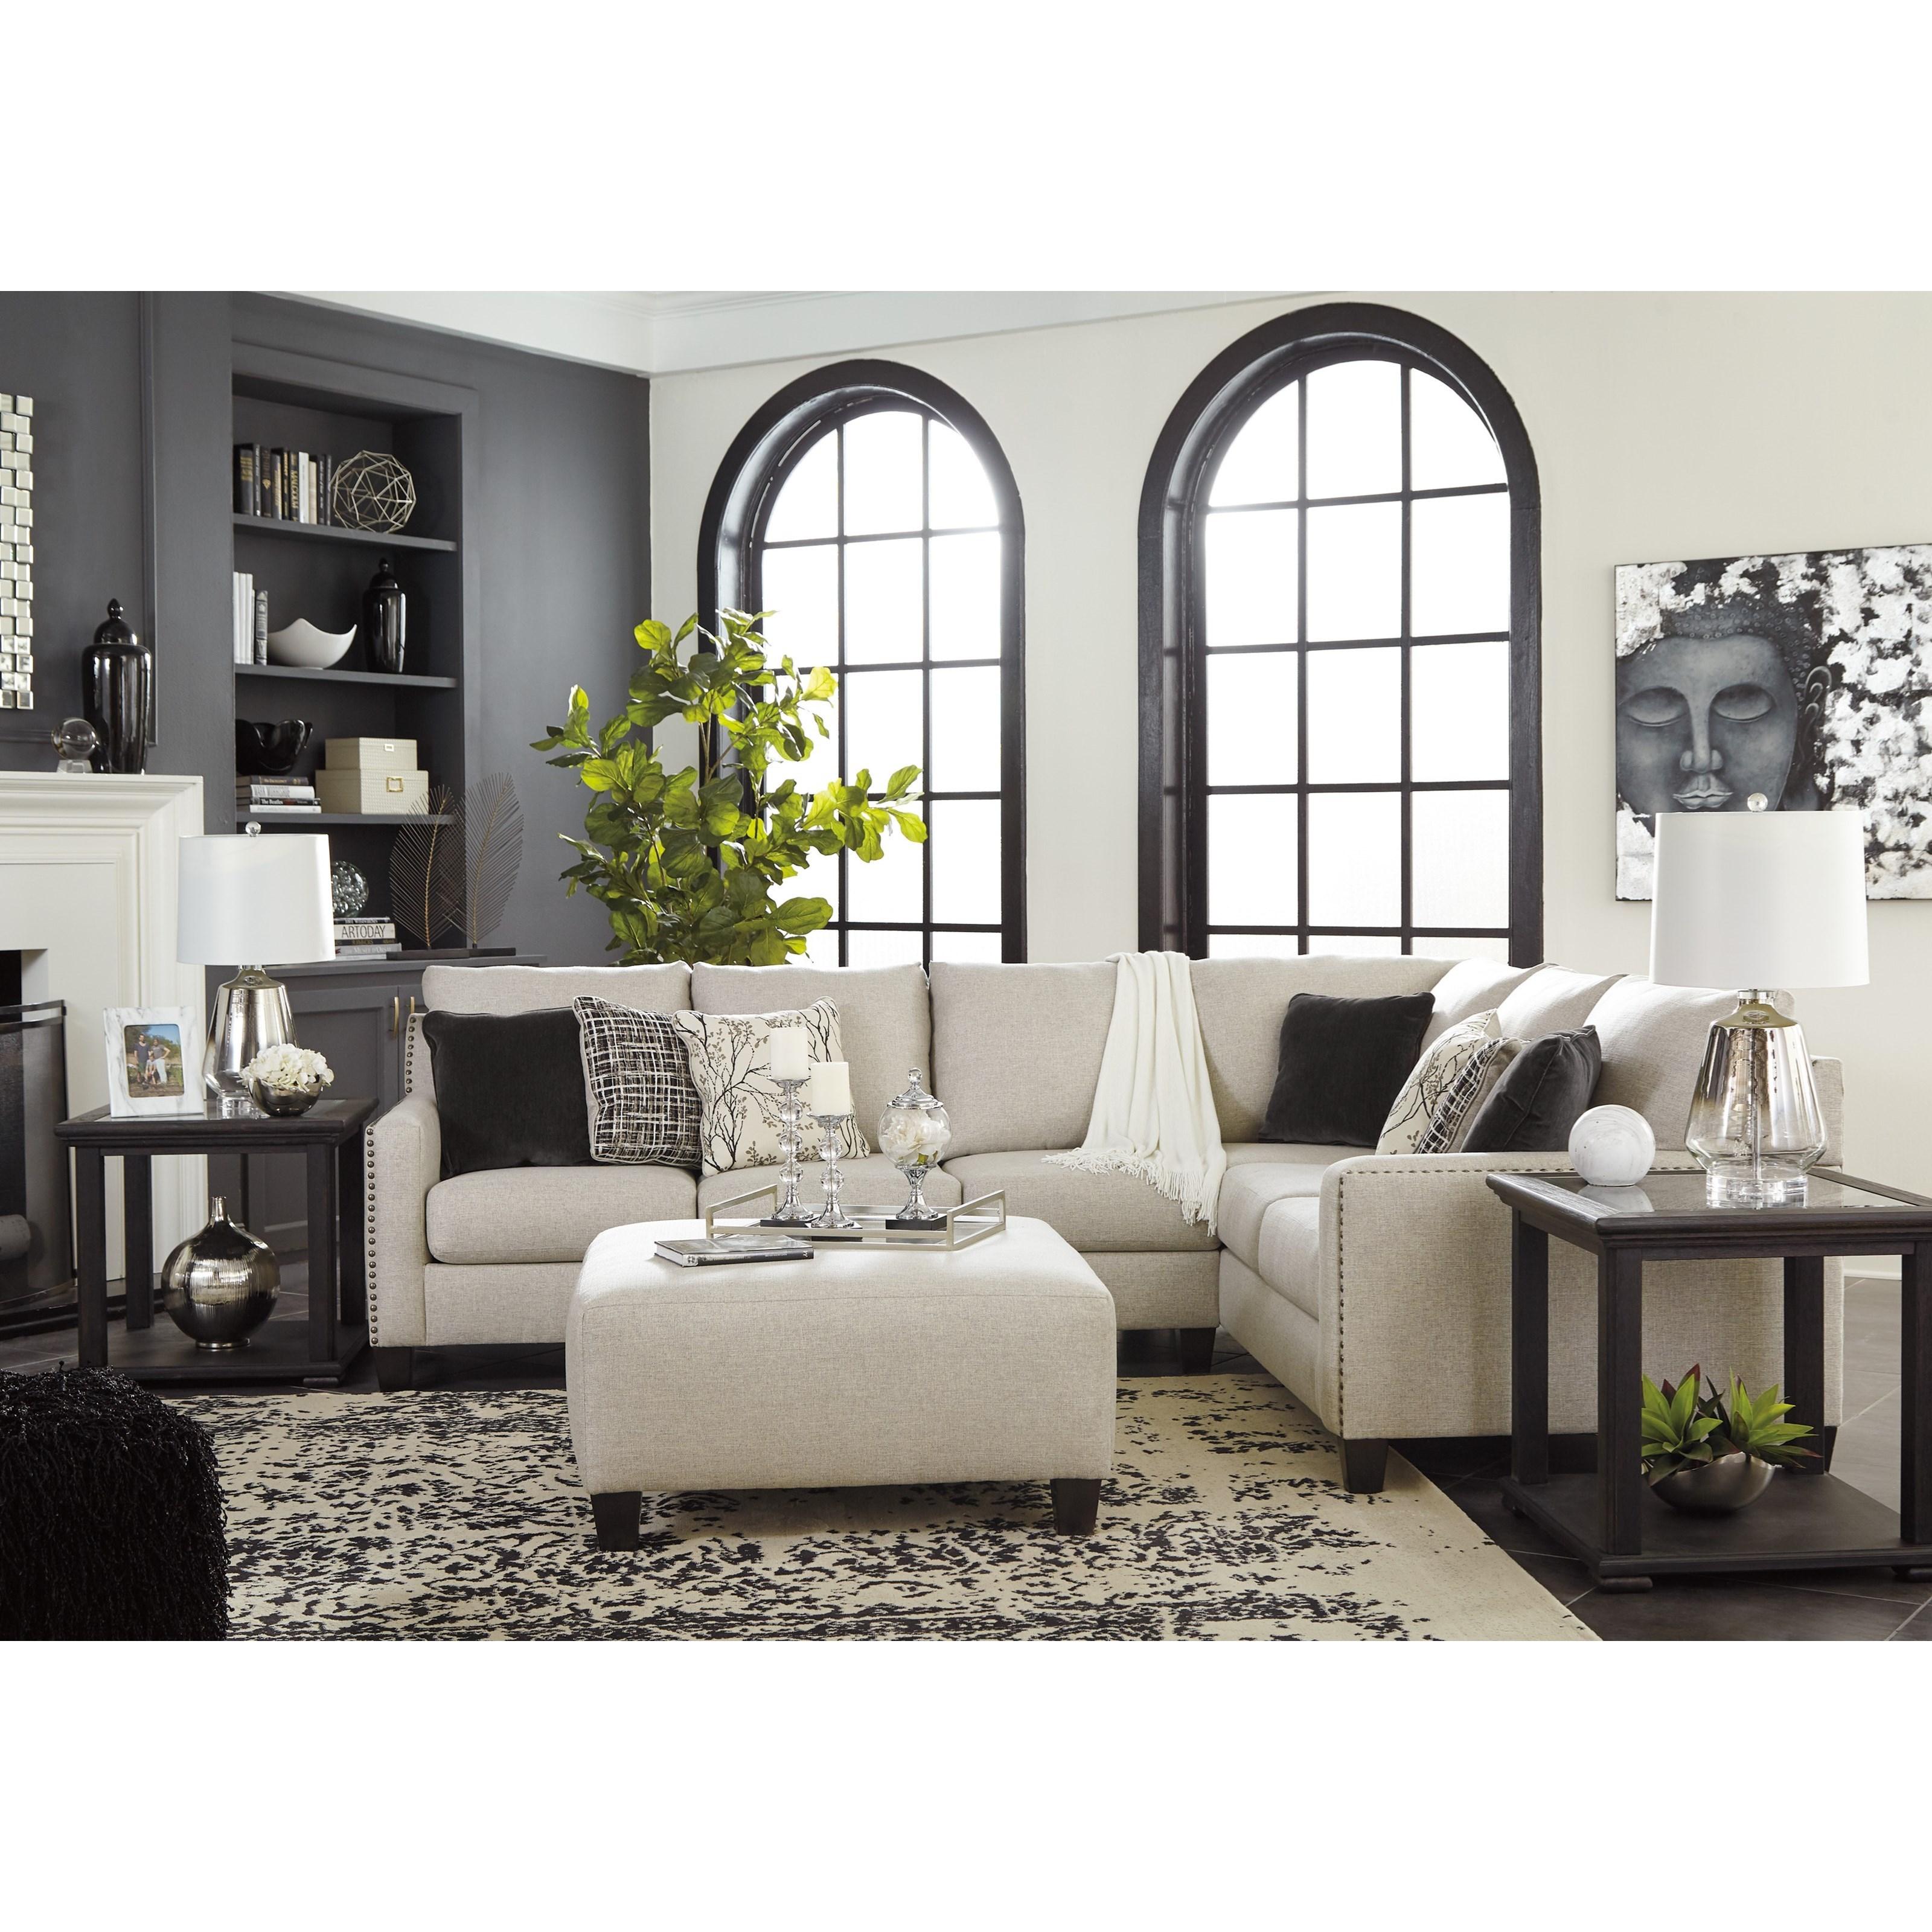 Hallenberg Living Room Group by Signature at Walker's Furniture